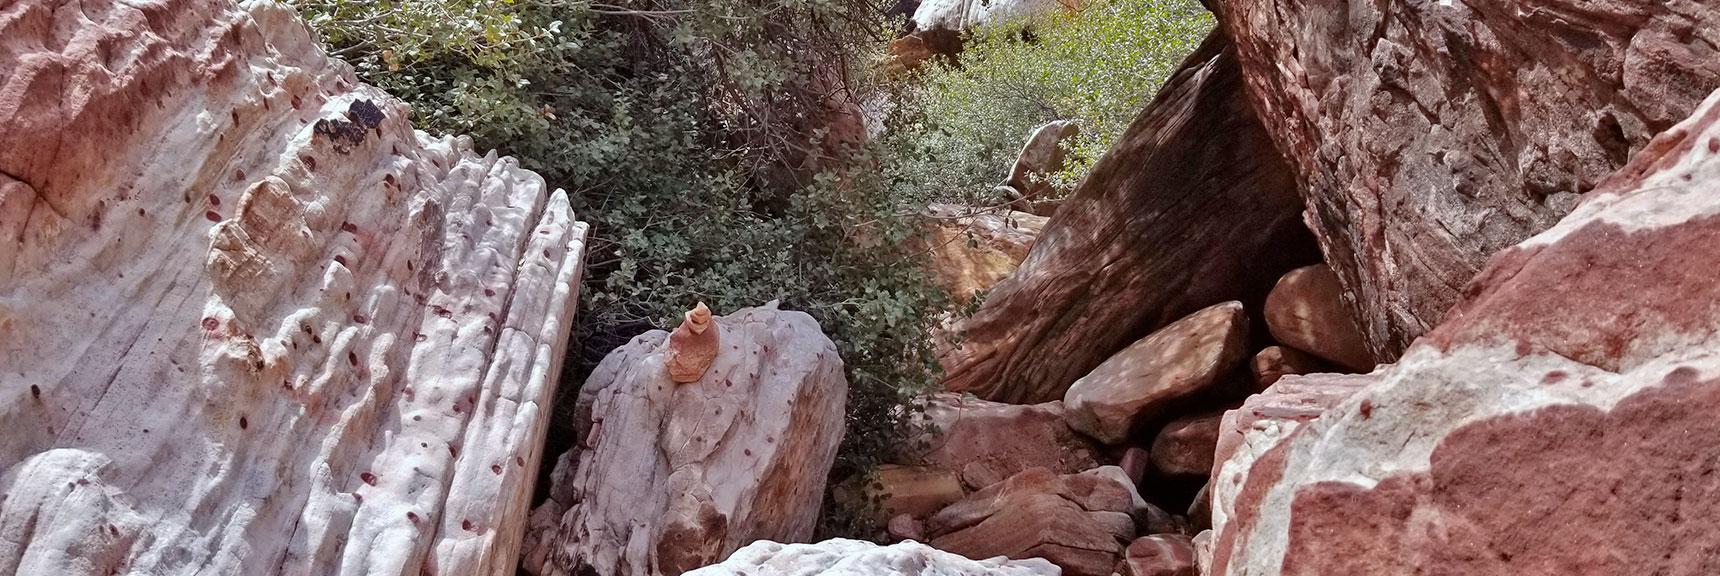 Boulders Along a Route Up Juniper Peak, Rainbow Mountain Wilderness, Nevada